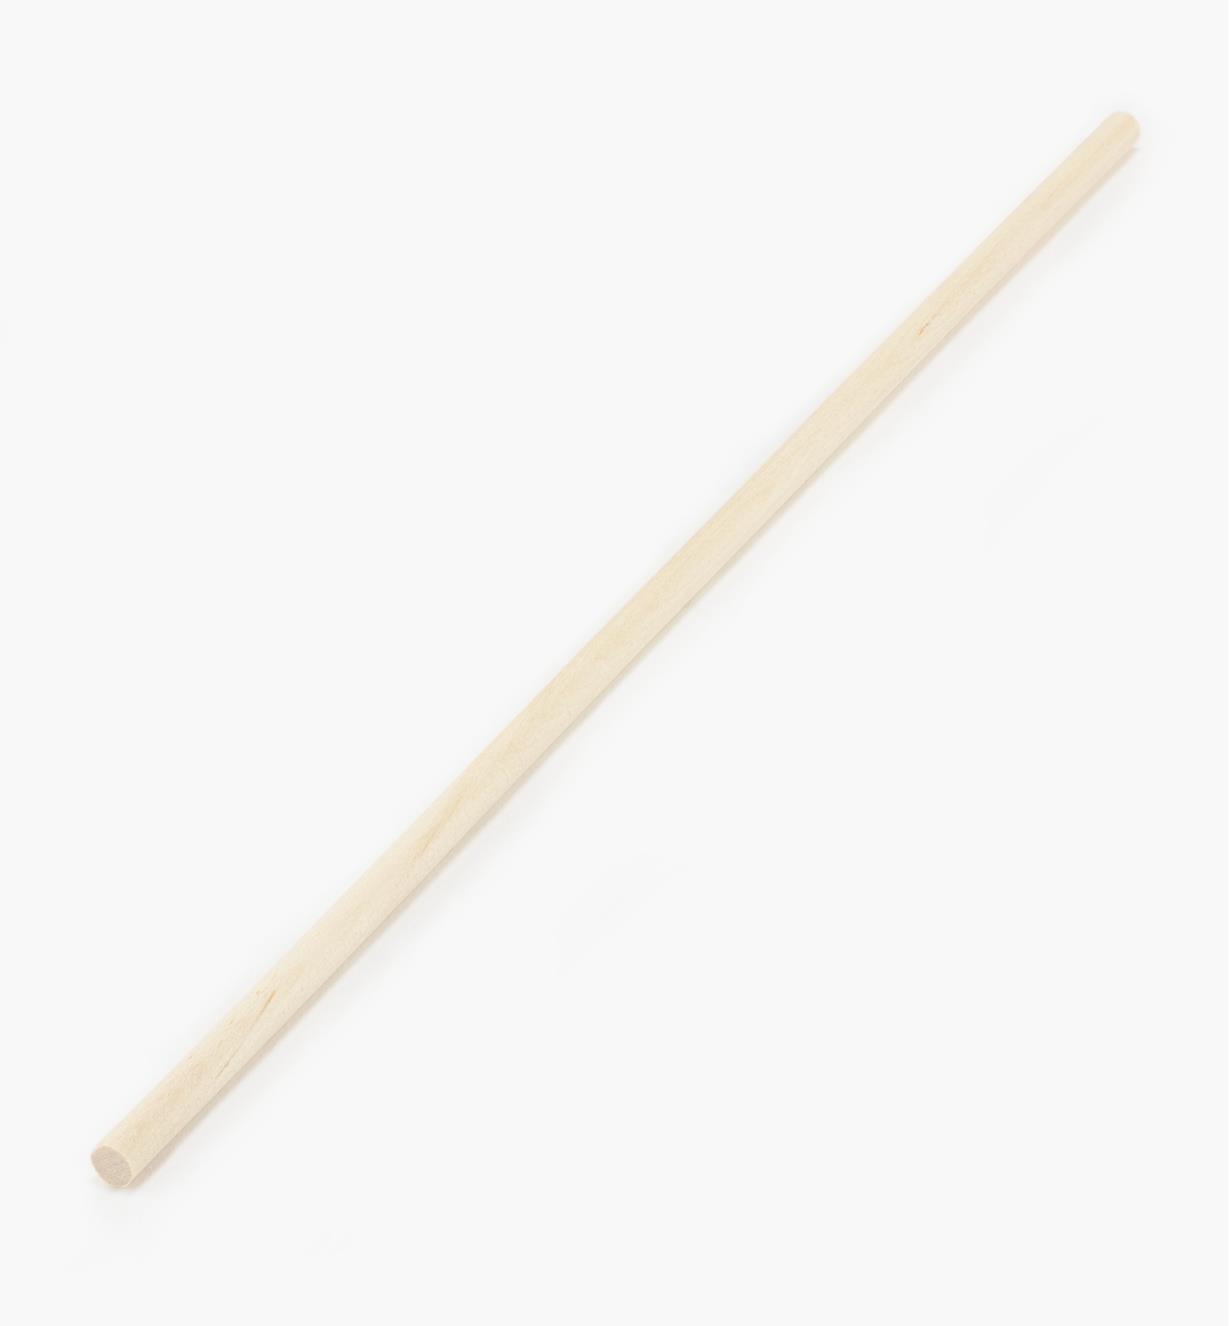 41K3001 - Goujon en bois dur de 1/4pox1pi